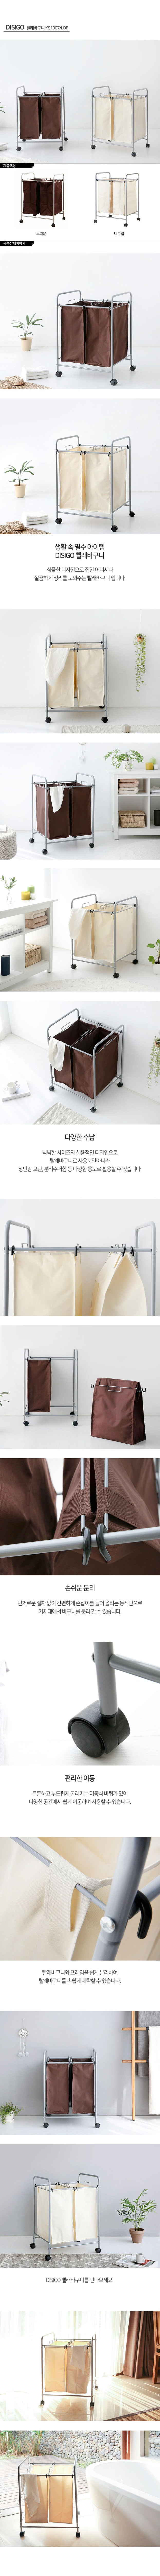 disigo_laundry_basket2-1.jpg